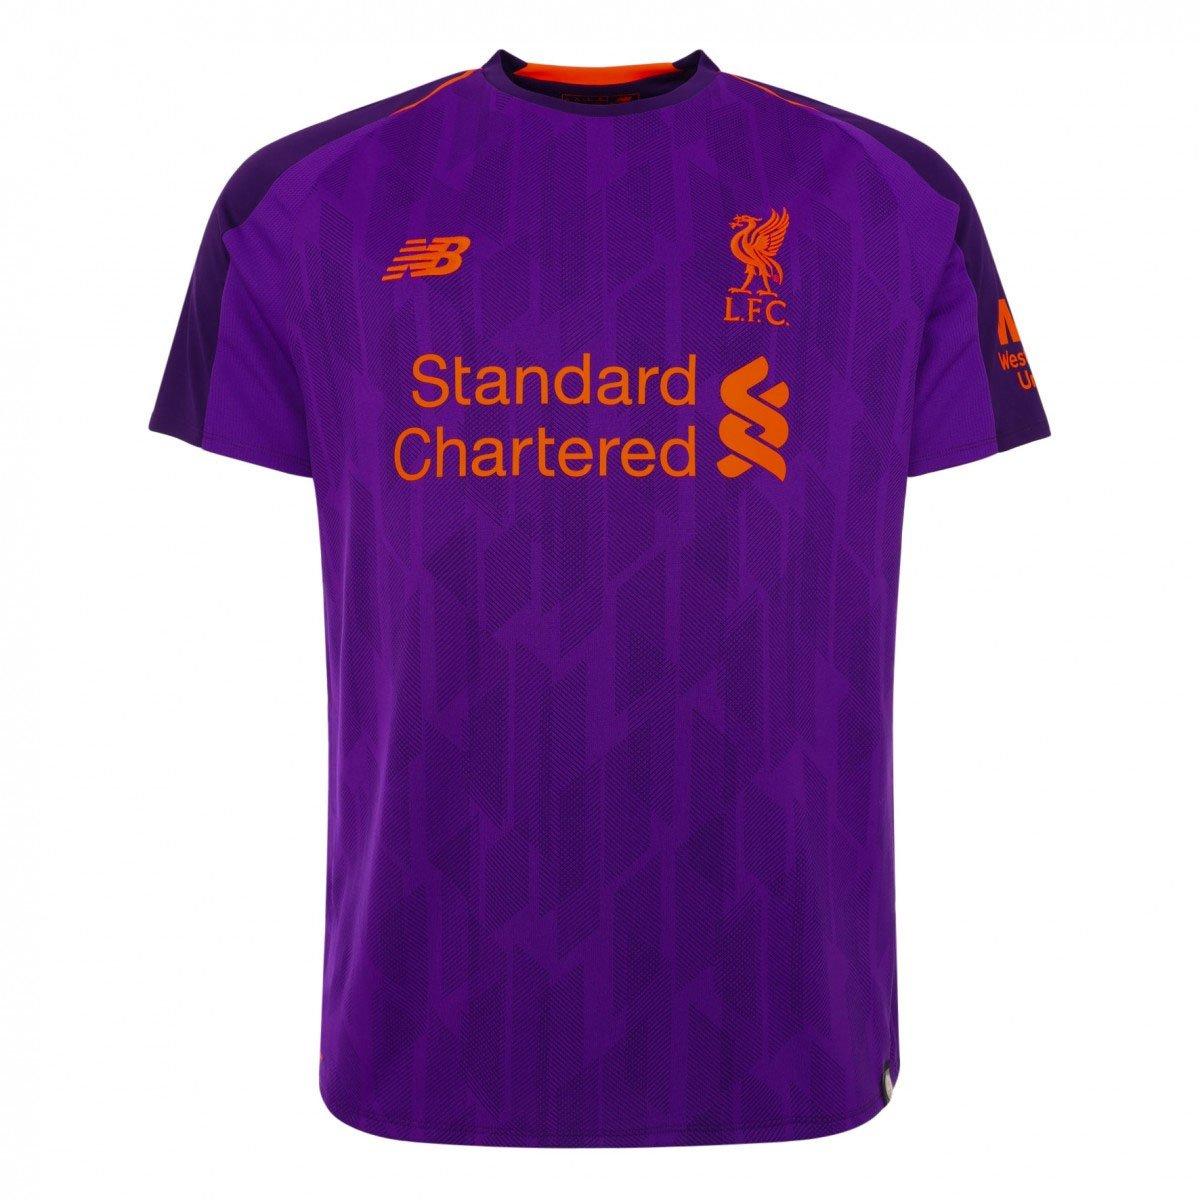 2018-2019 Liverpool Away Football Shirt B078GWC9ZVPurple XL 44-46\